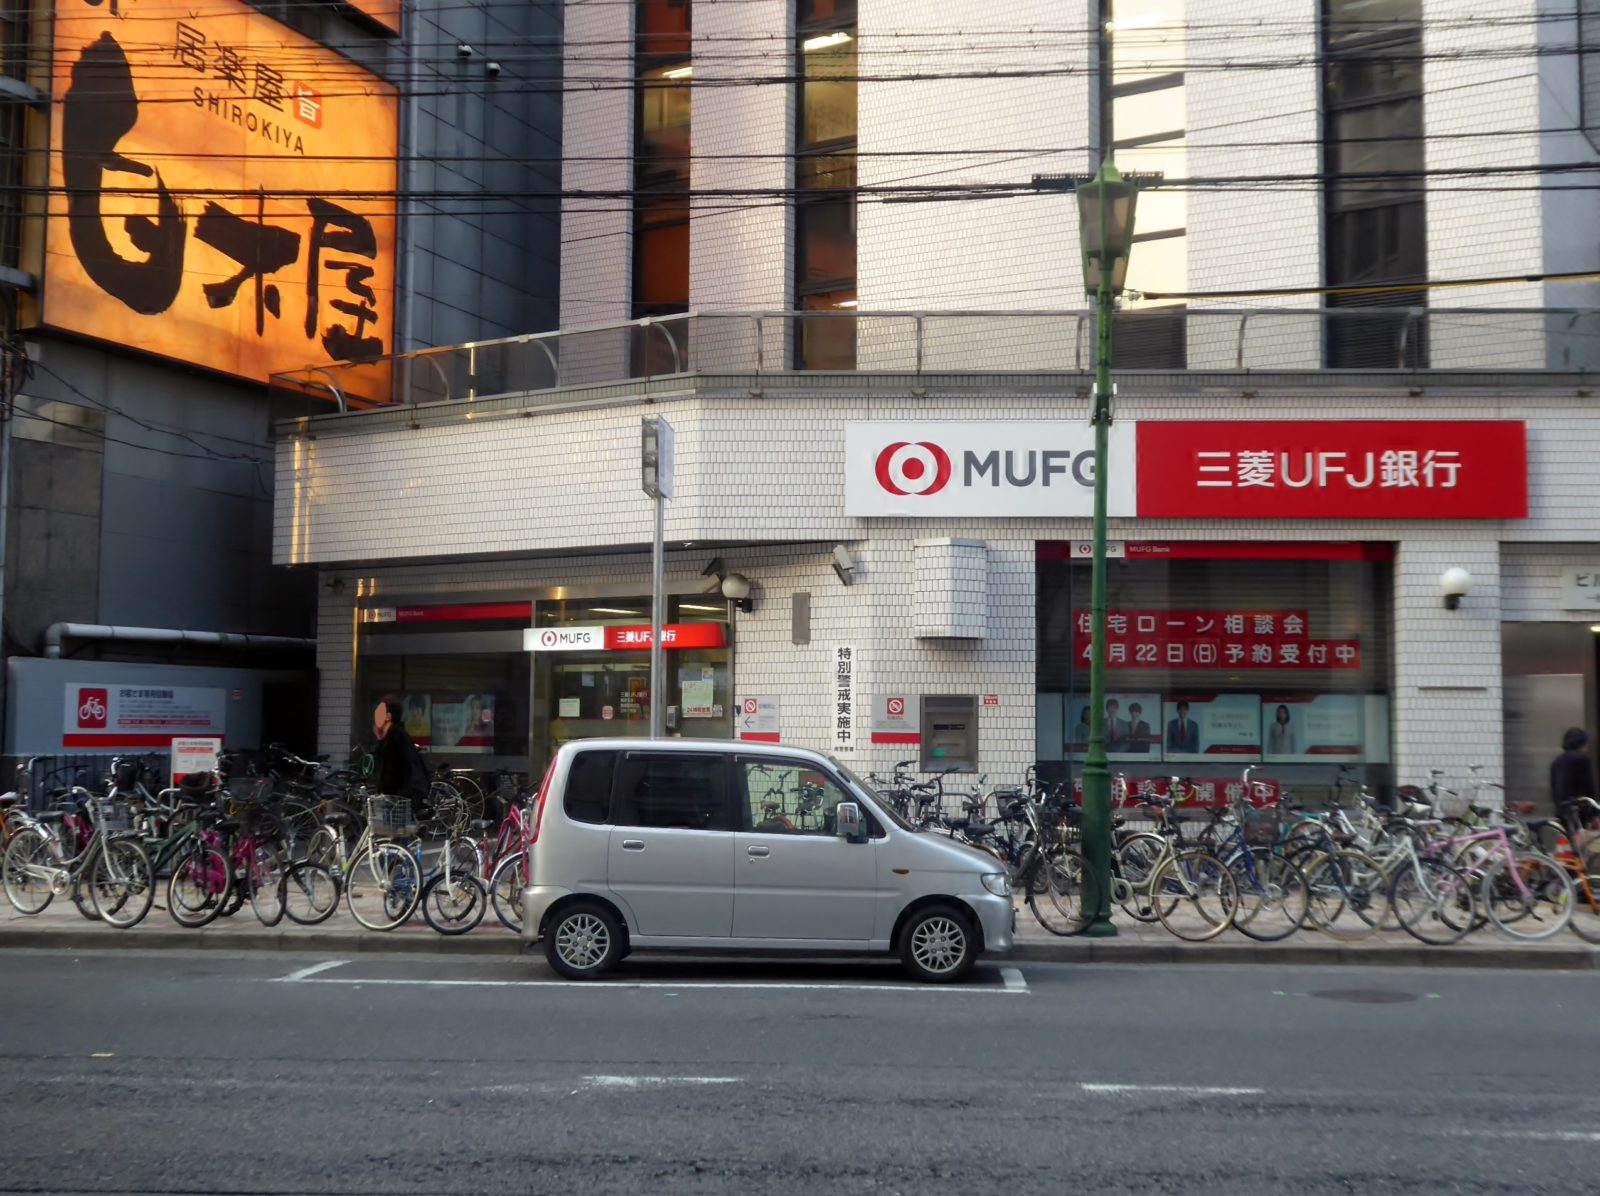 MUFG Bank Akamai Technologies Blockchain Payments Network